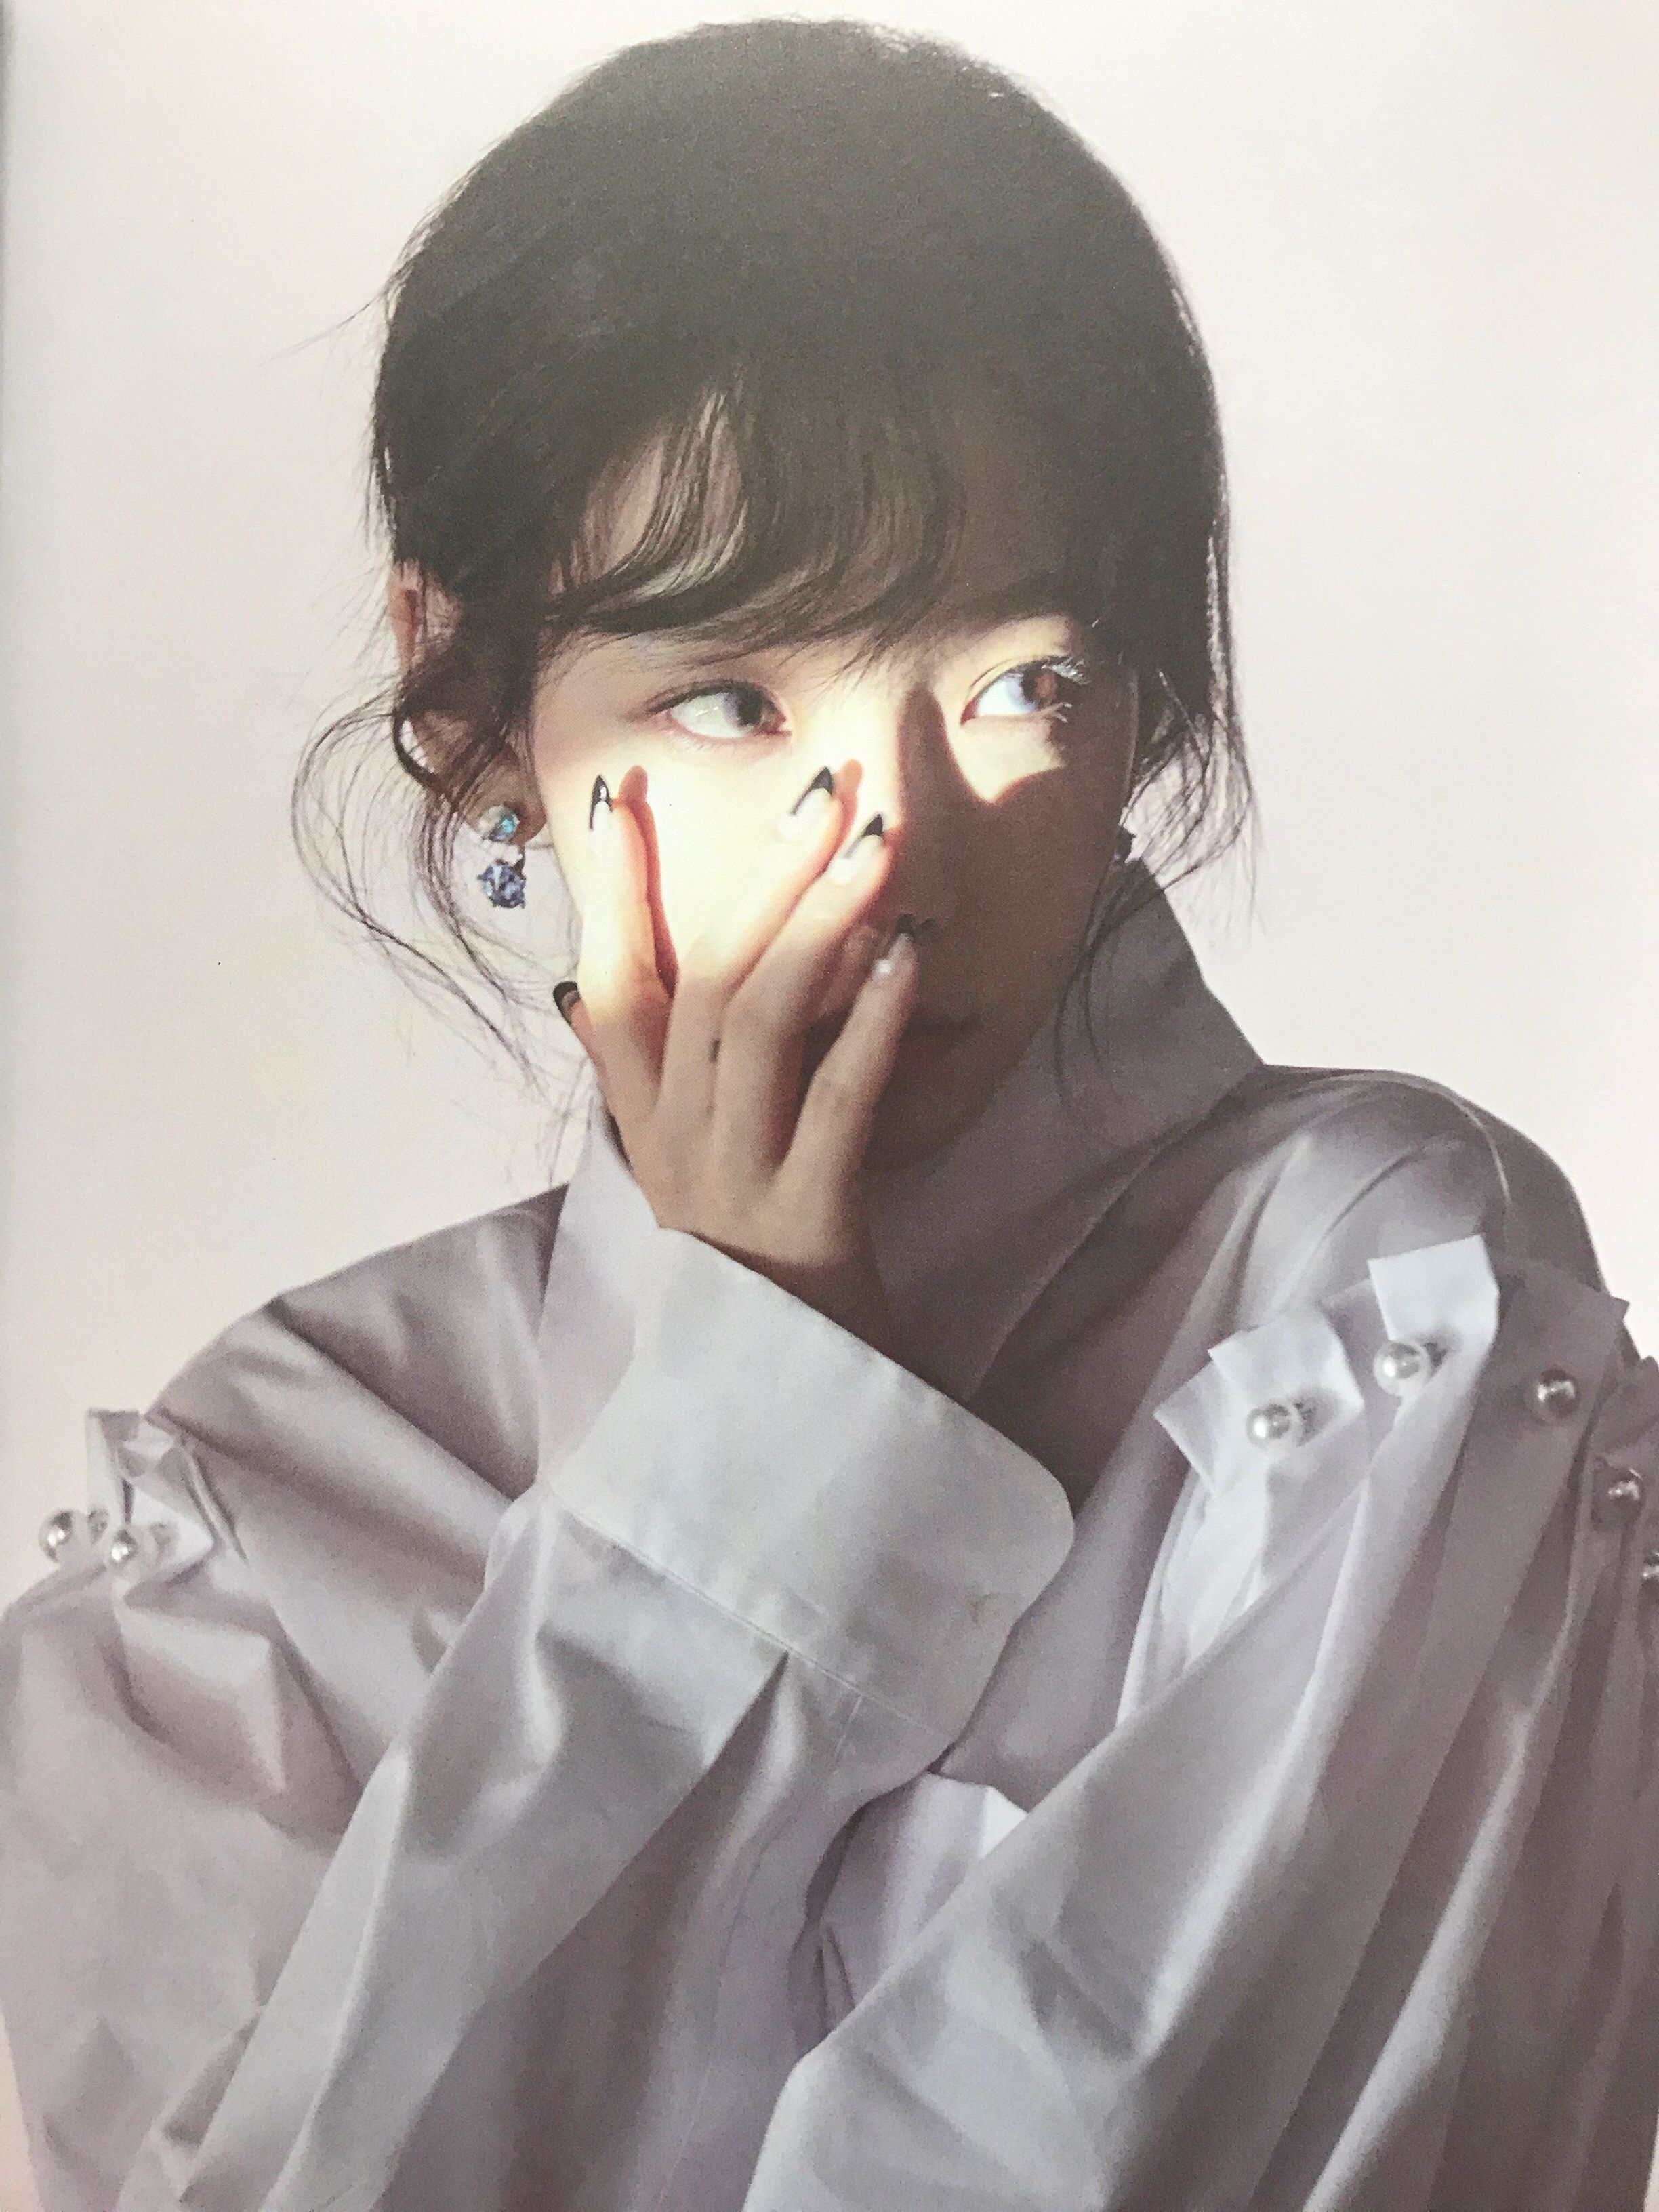 170930 Digital Photo-book SNSD Taeyeon | Korean photoshoot ...